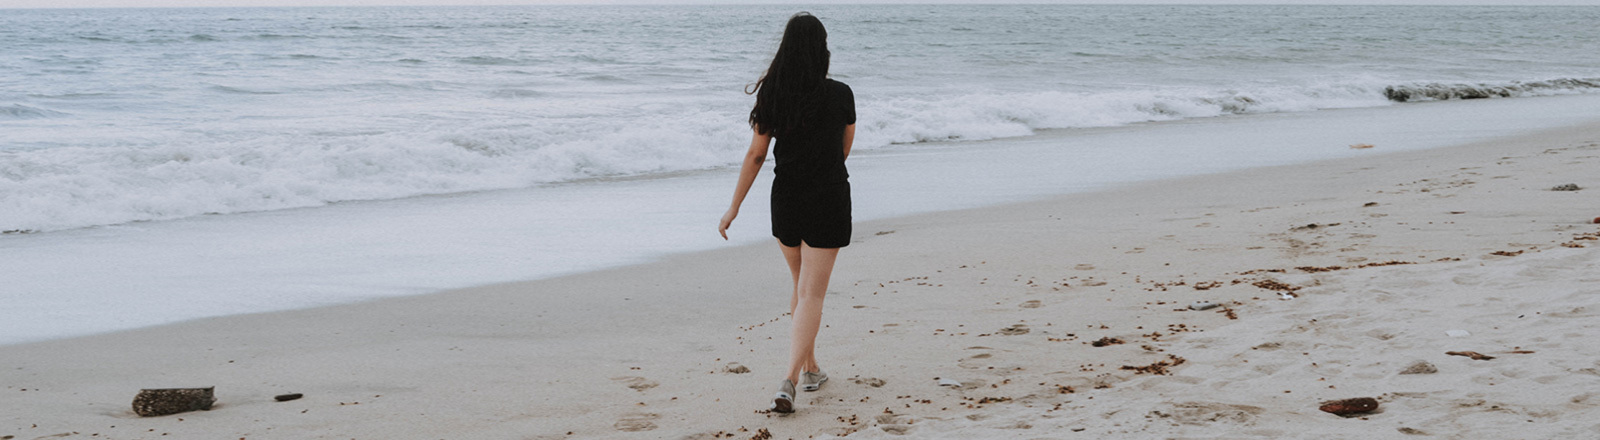 Eine Frau geht selbstbewusst am Strand entlang.